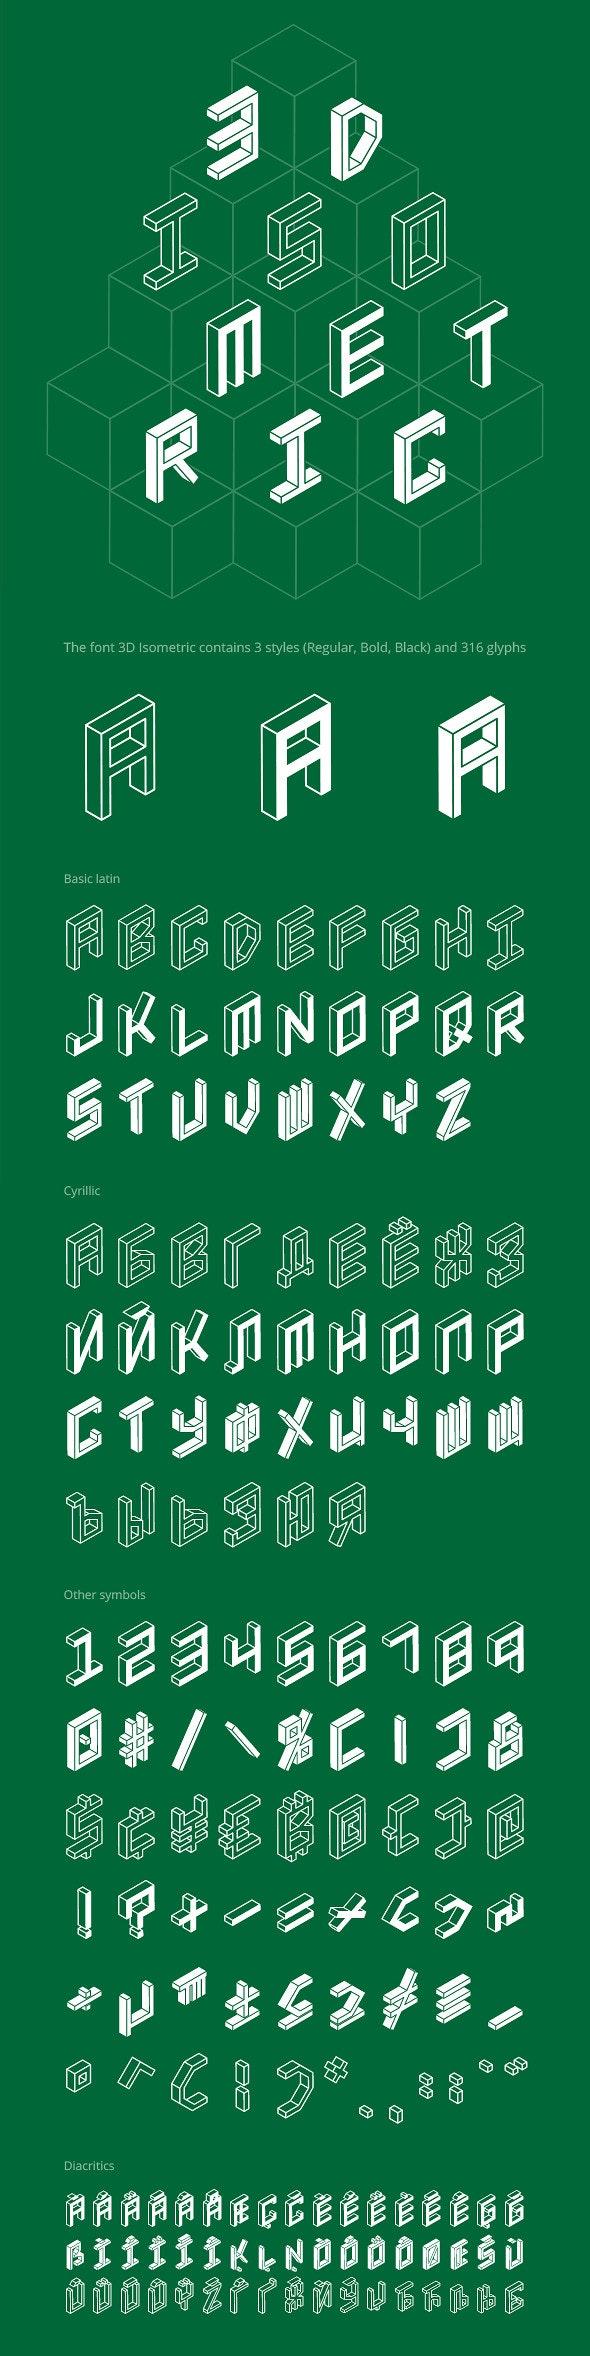 3D Isometric Font - Futuristic Decorative